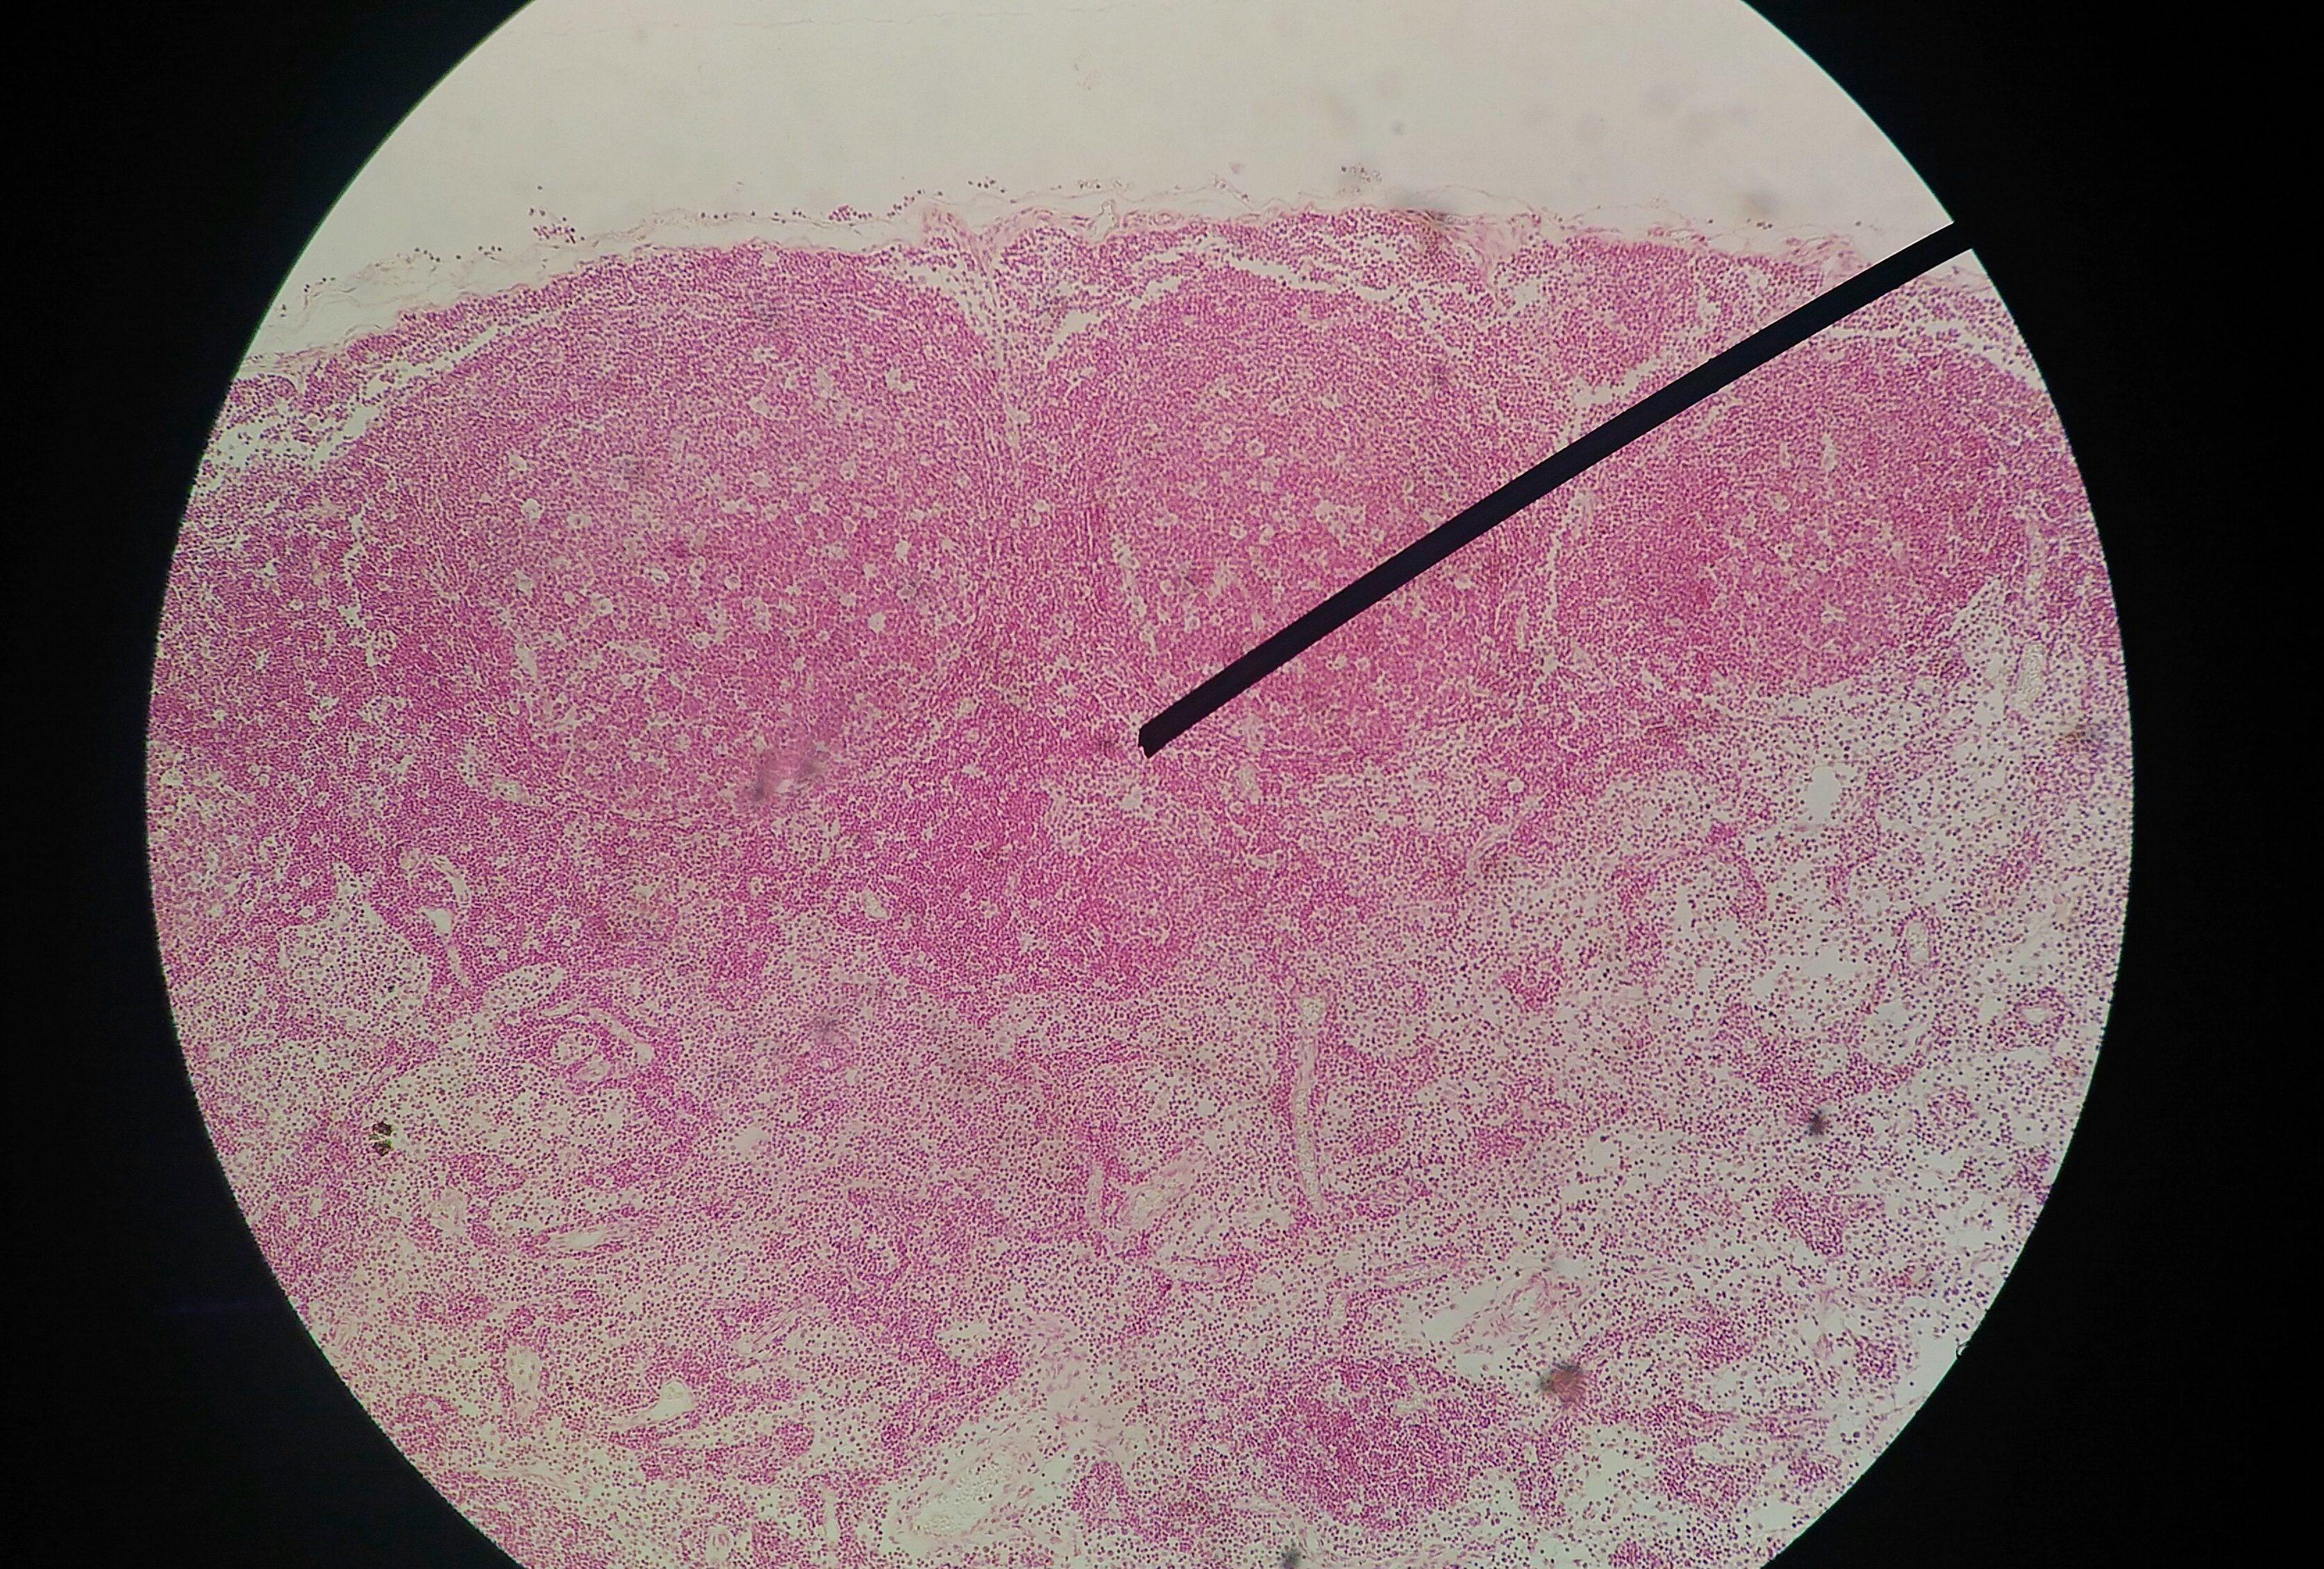 il papilloma virus si vede dal pap test